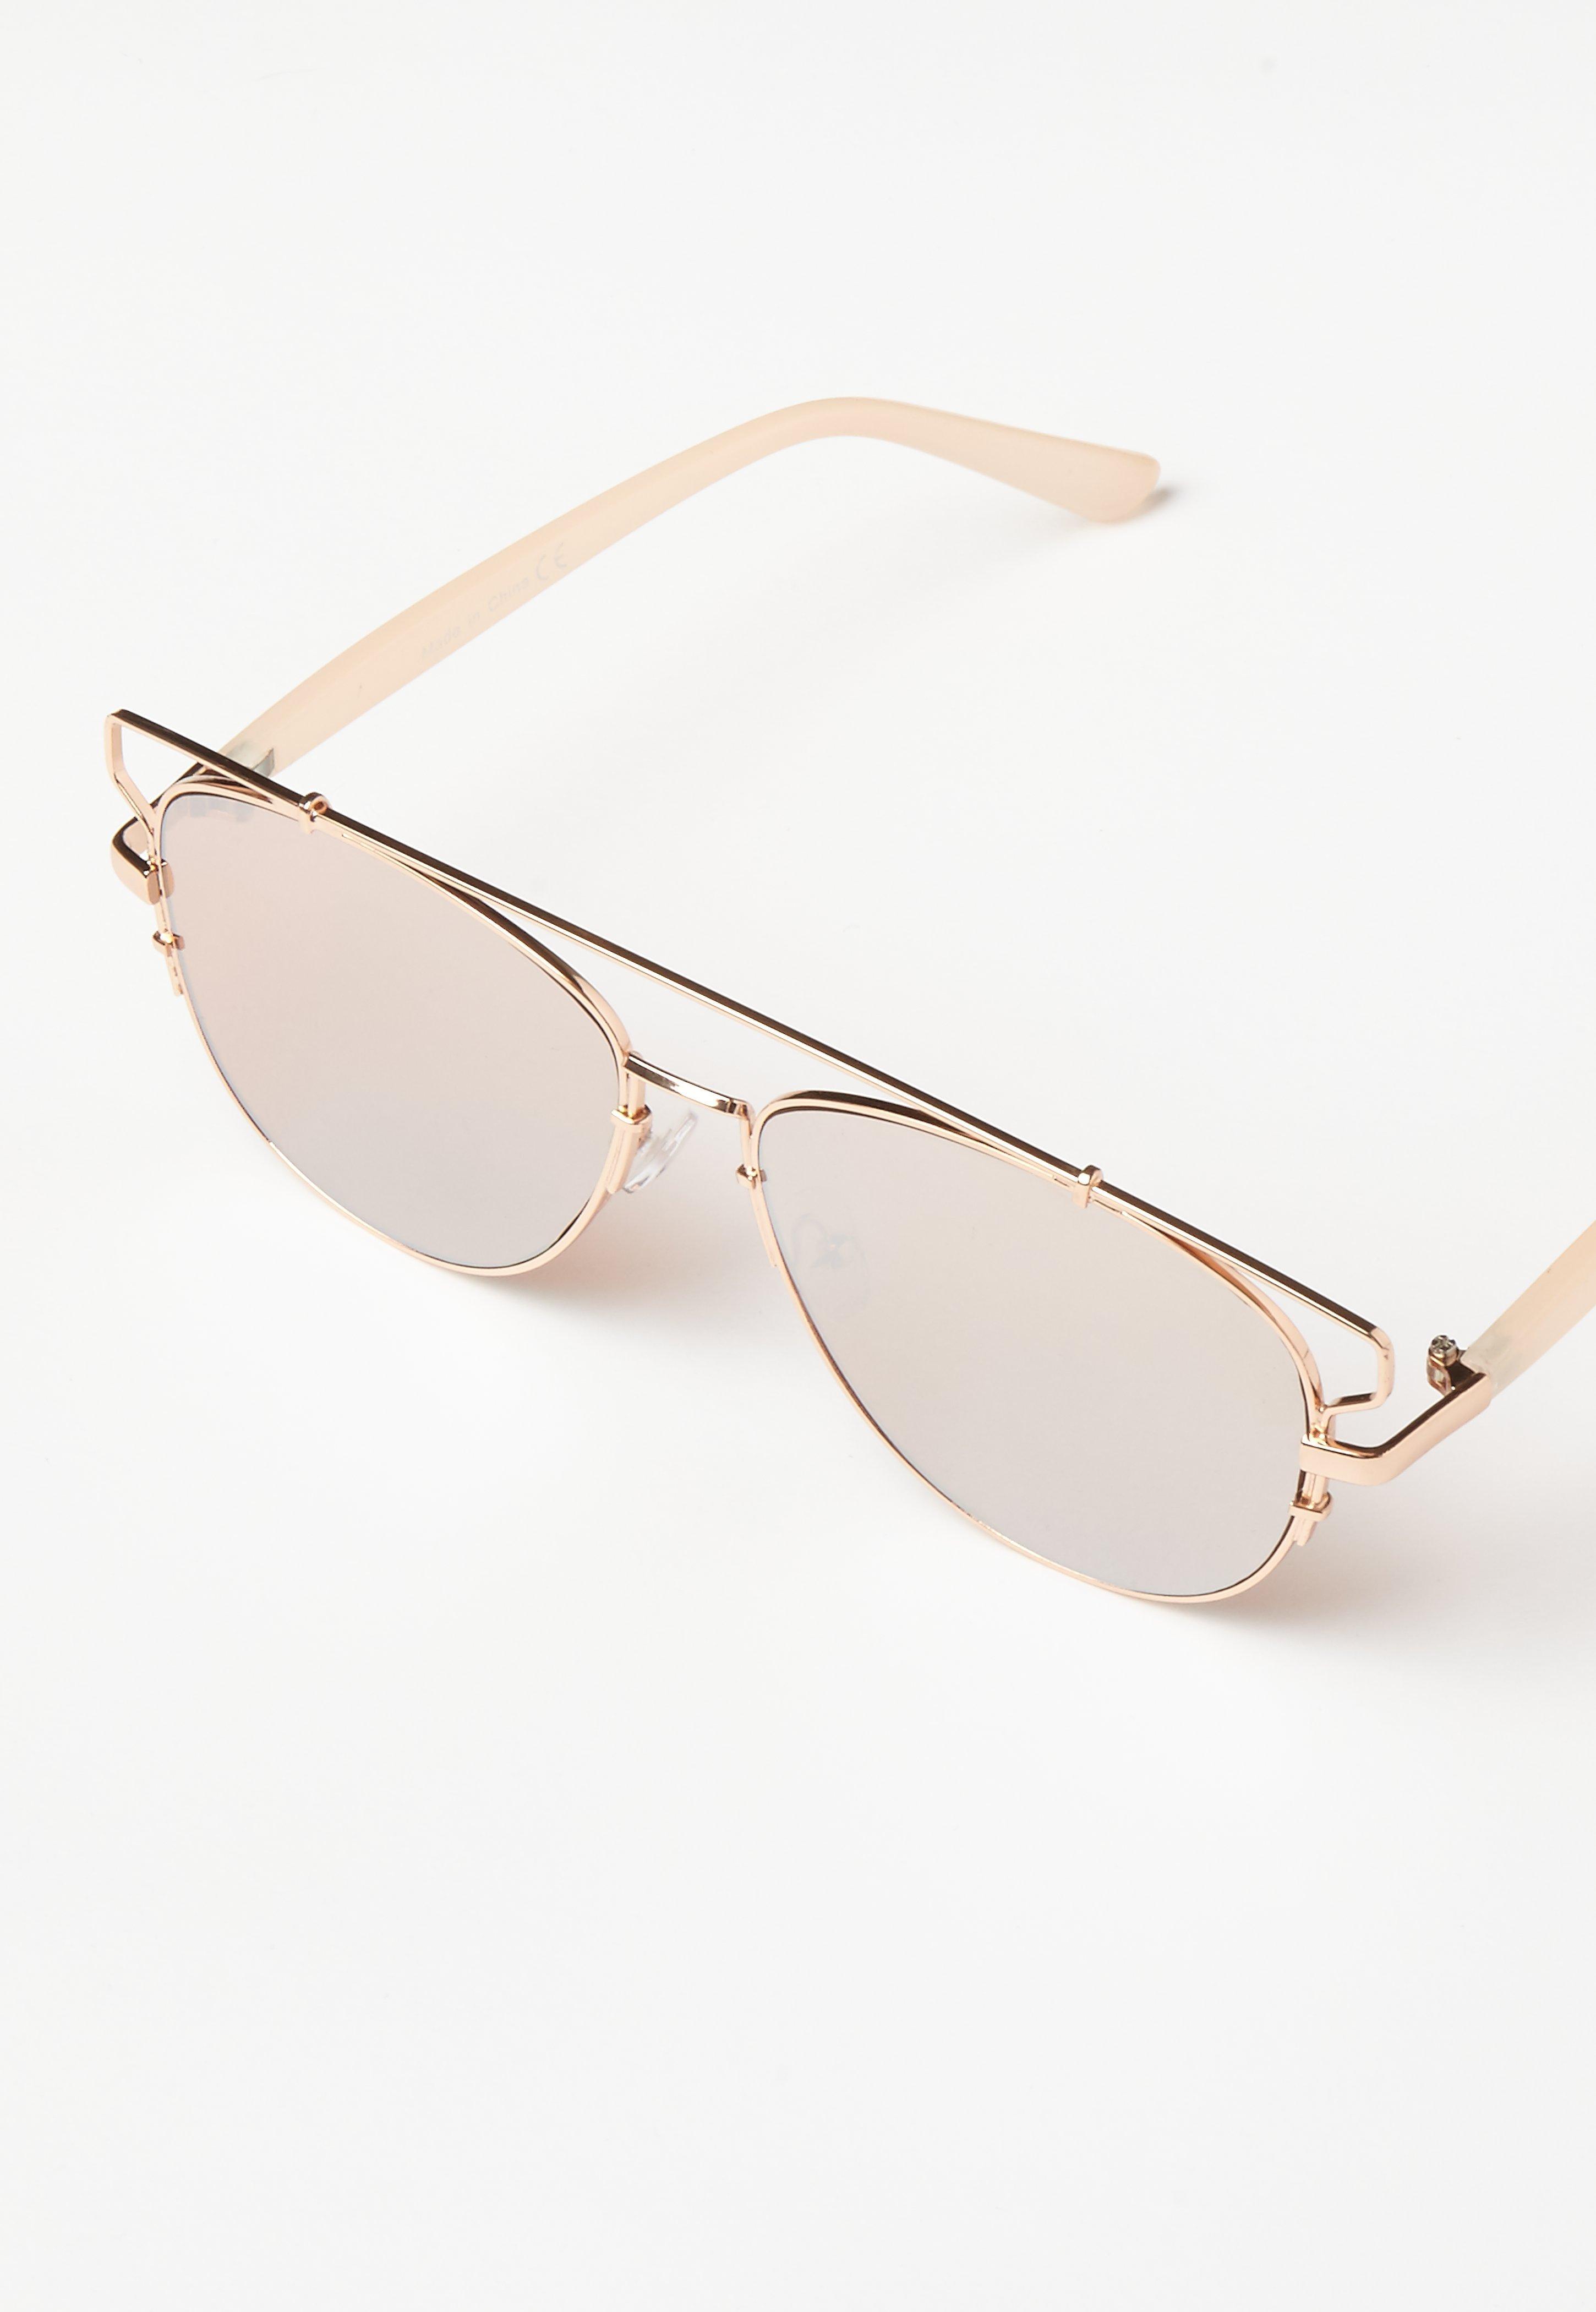 Rose Gold Metal Frame Aviator Sunglasses - Missguided